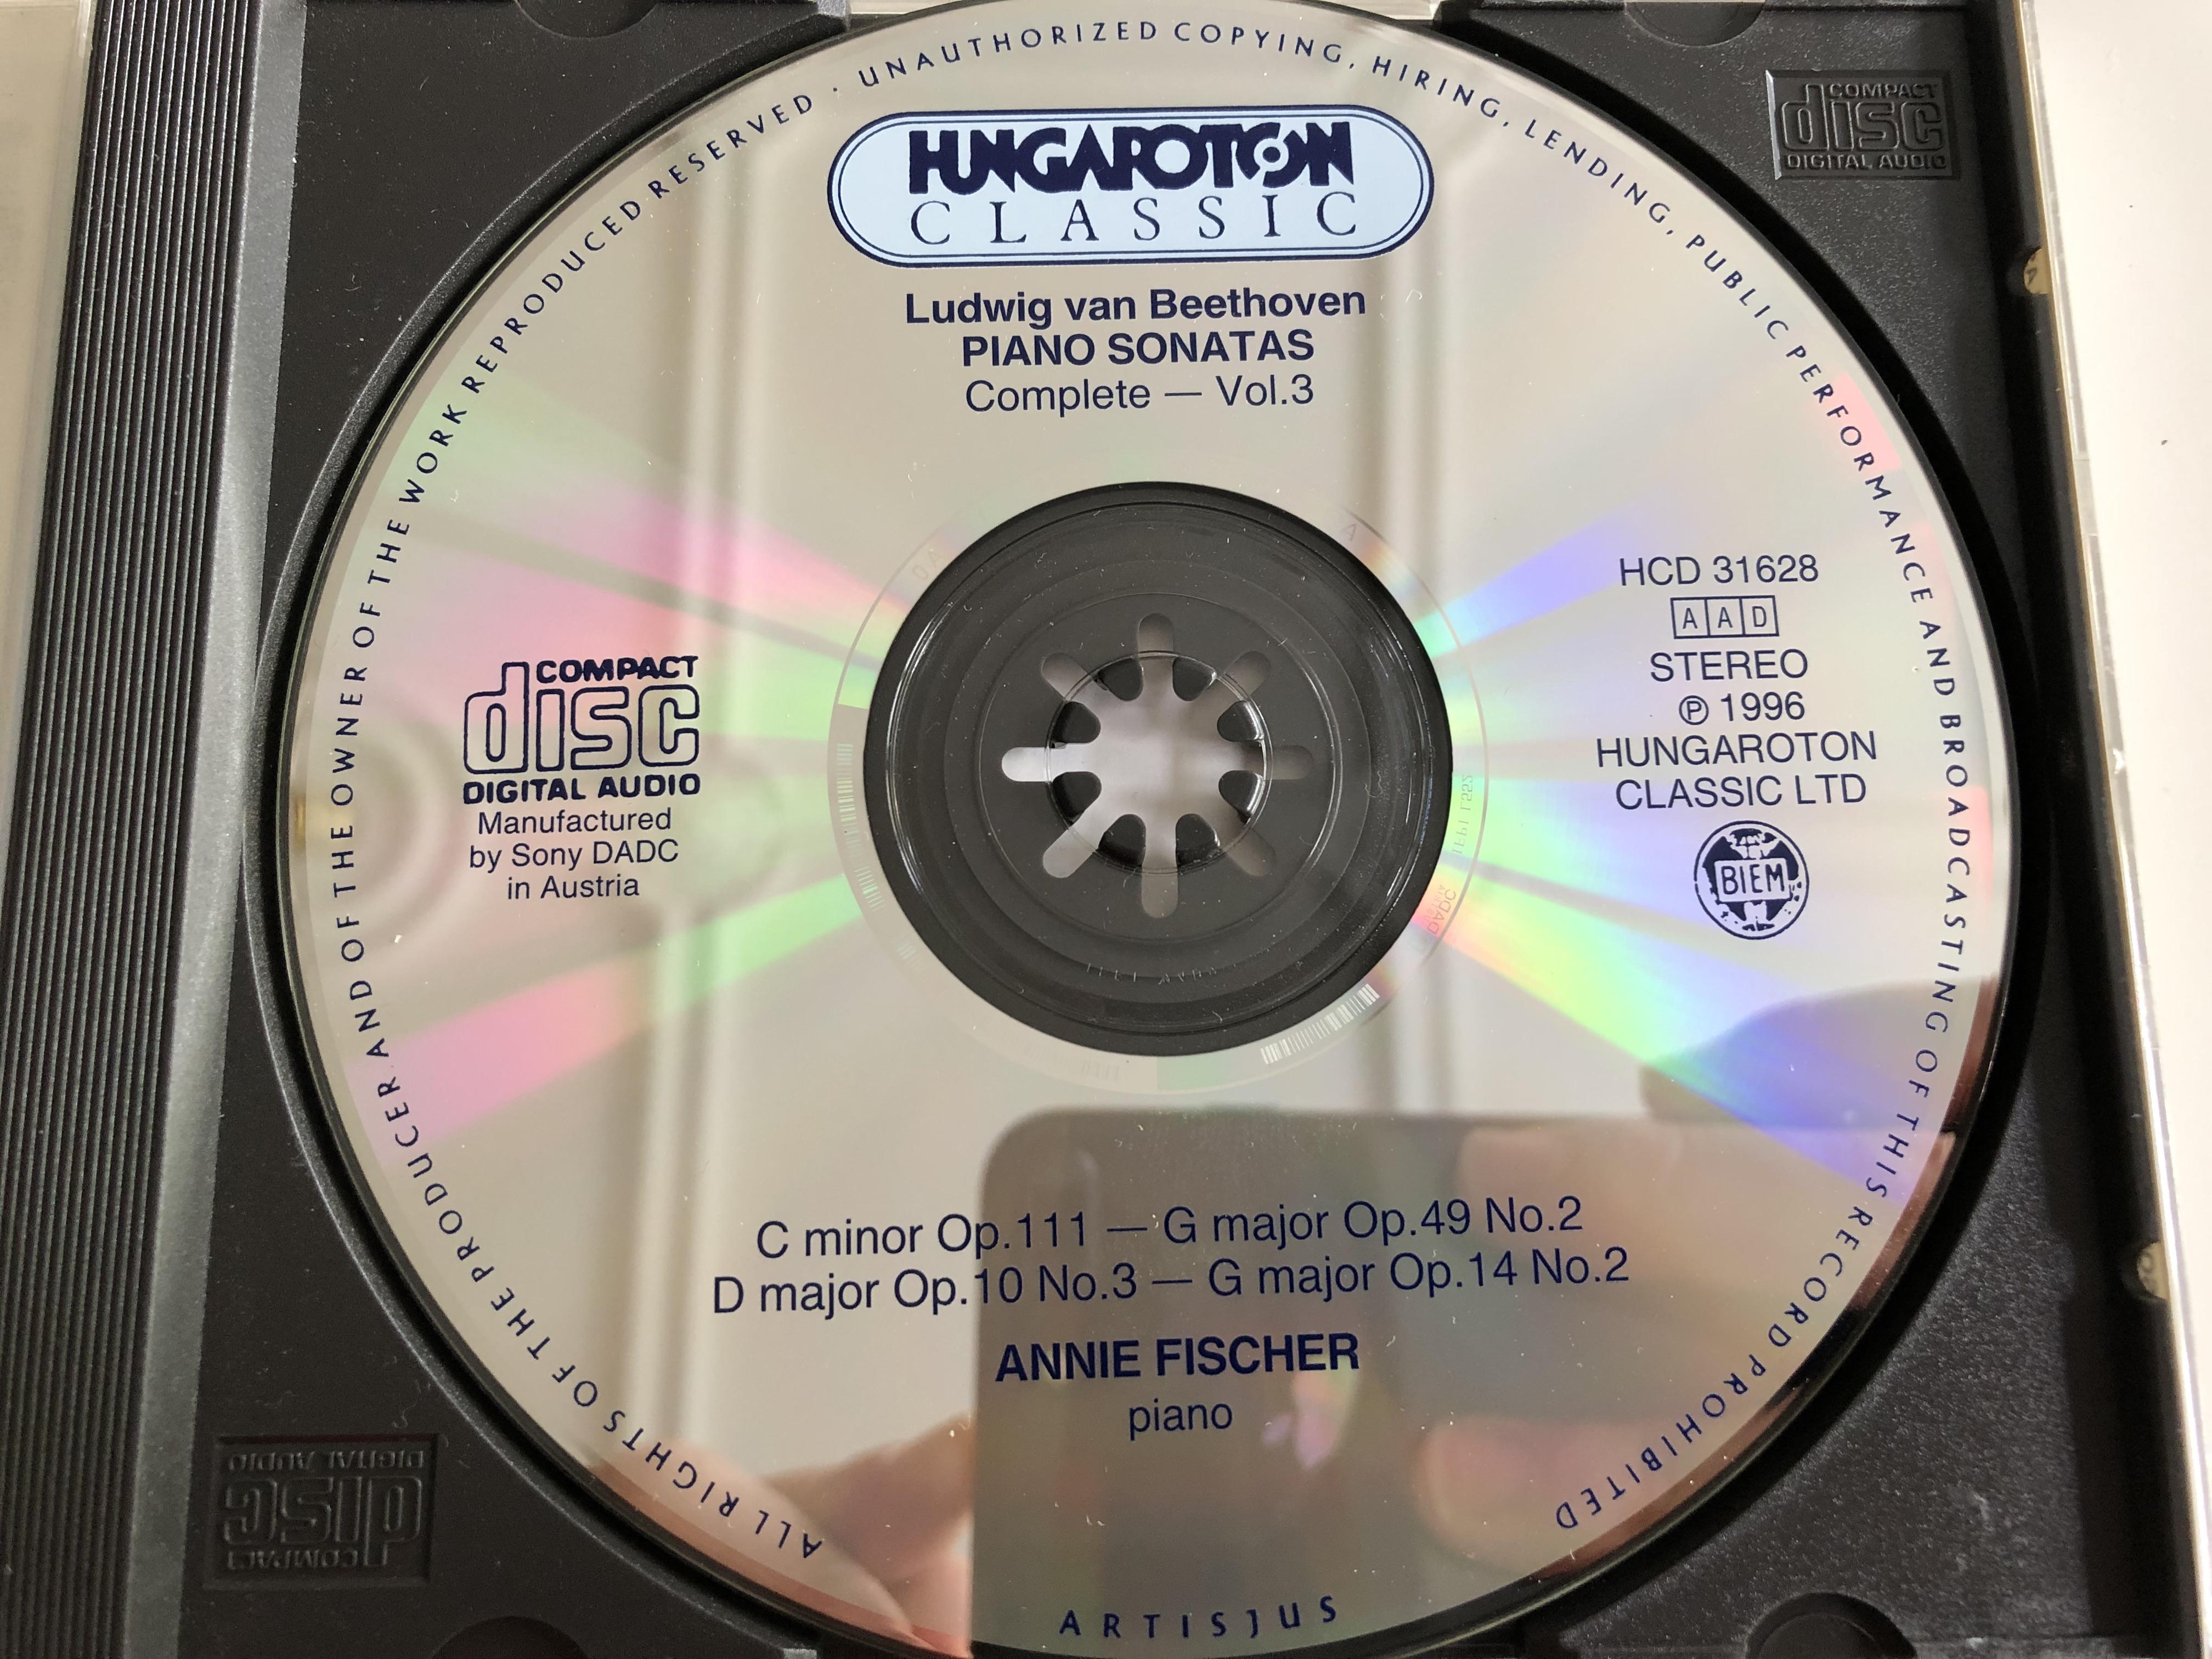 annie-fischer-ludwig-van-beethoven-piano-sonatas-complete-vol.-3-audio-cd-1996-hungaroton-classic-hcd-31628-3-.jpg